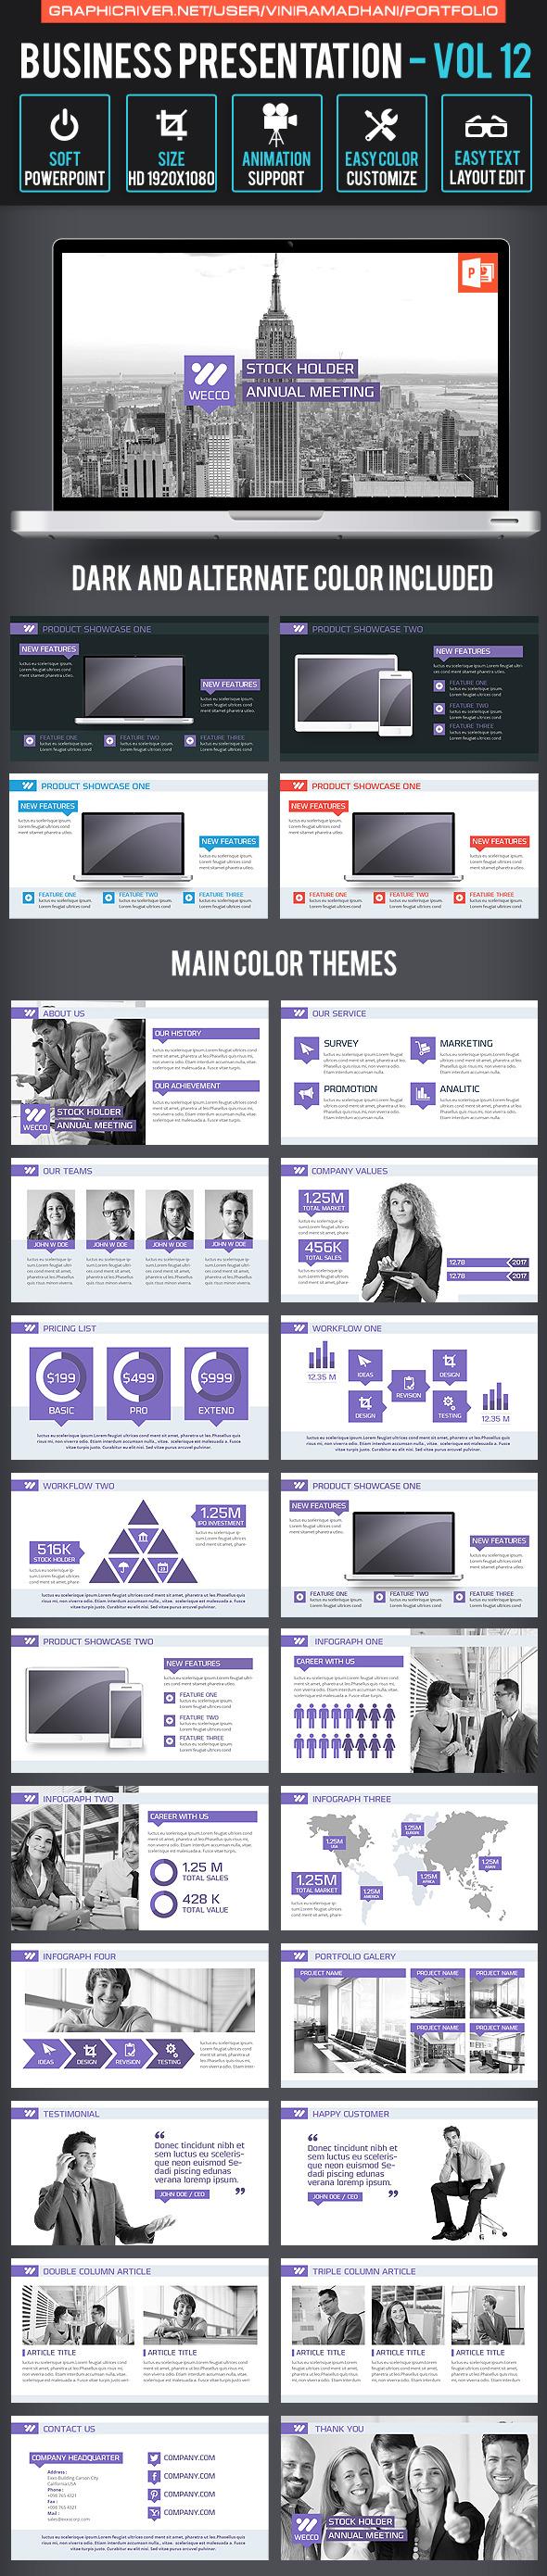 Business Presentation | Volume 12